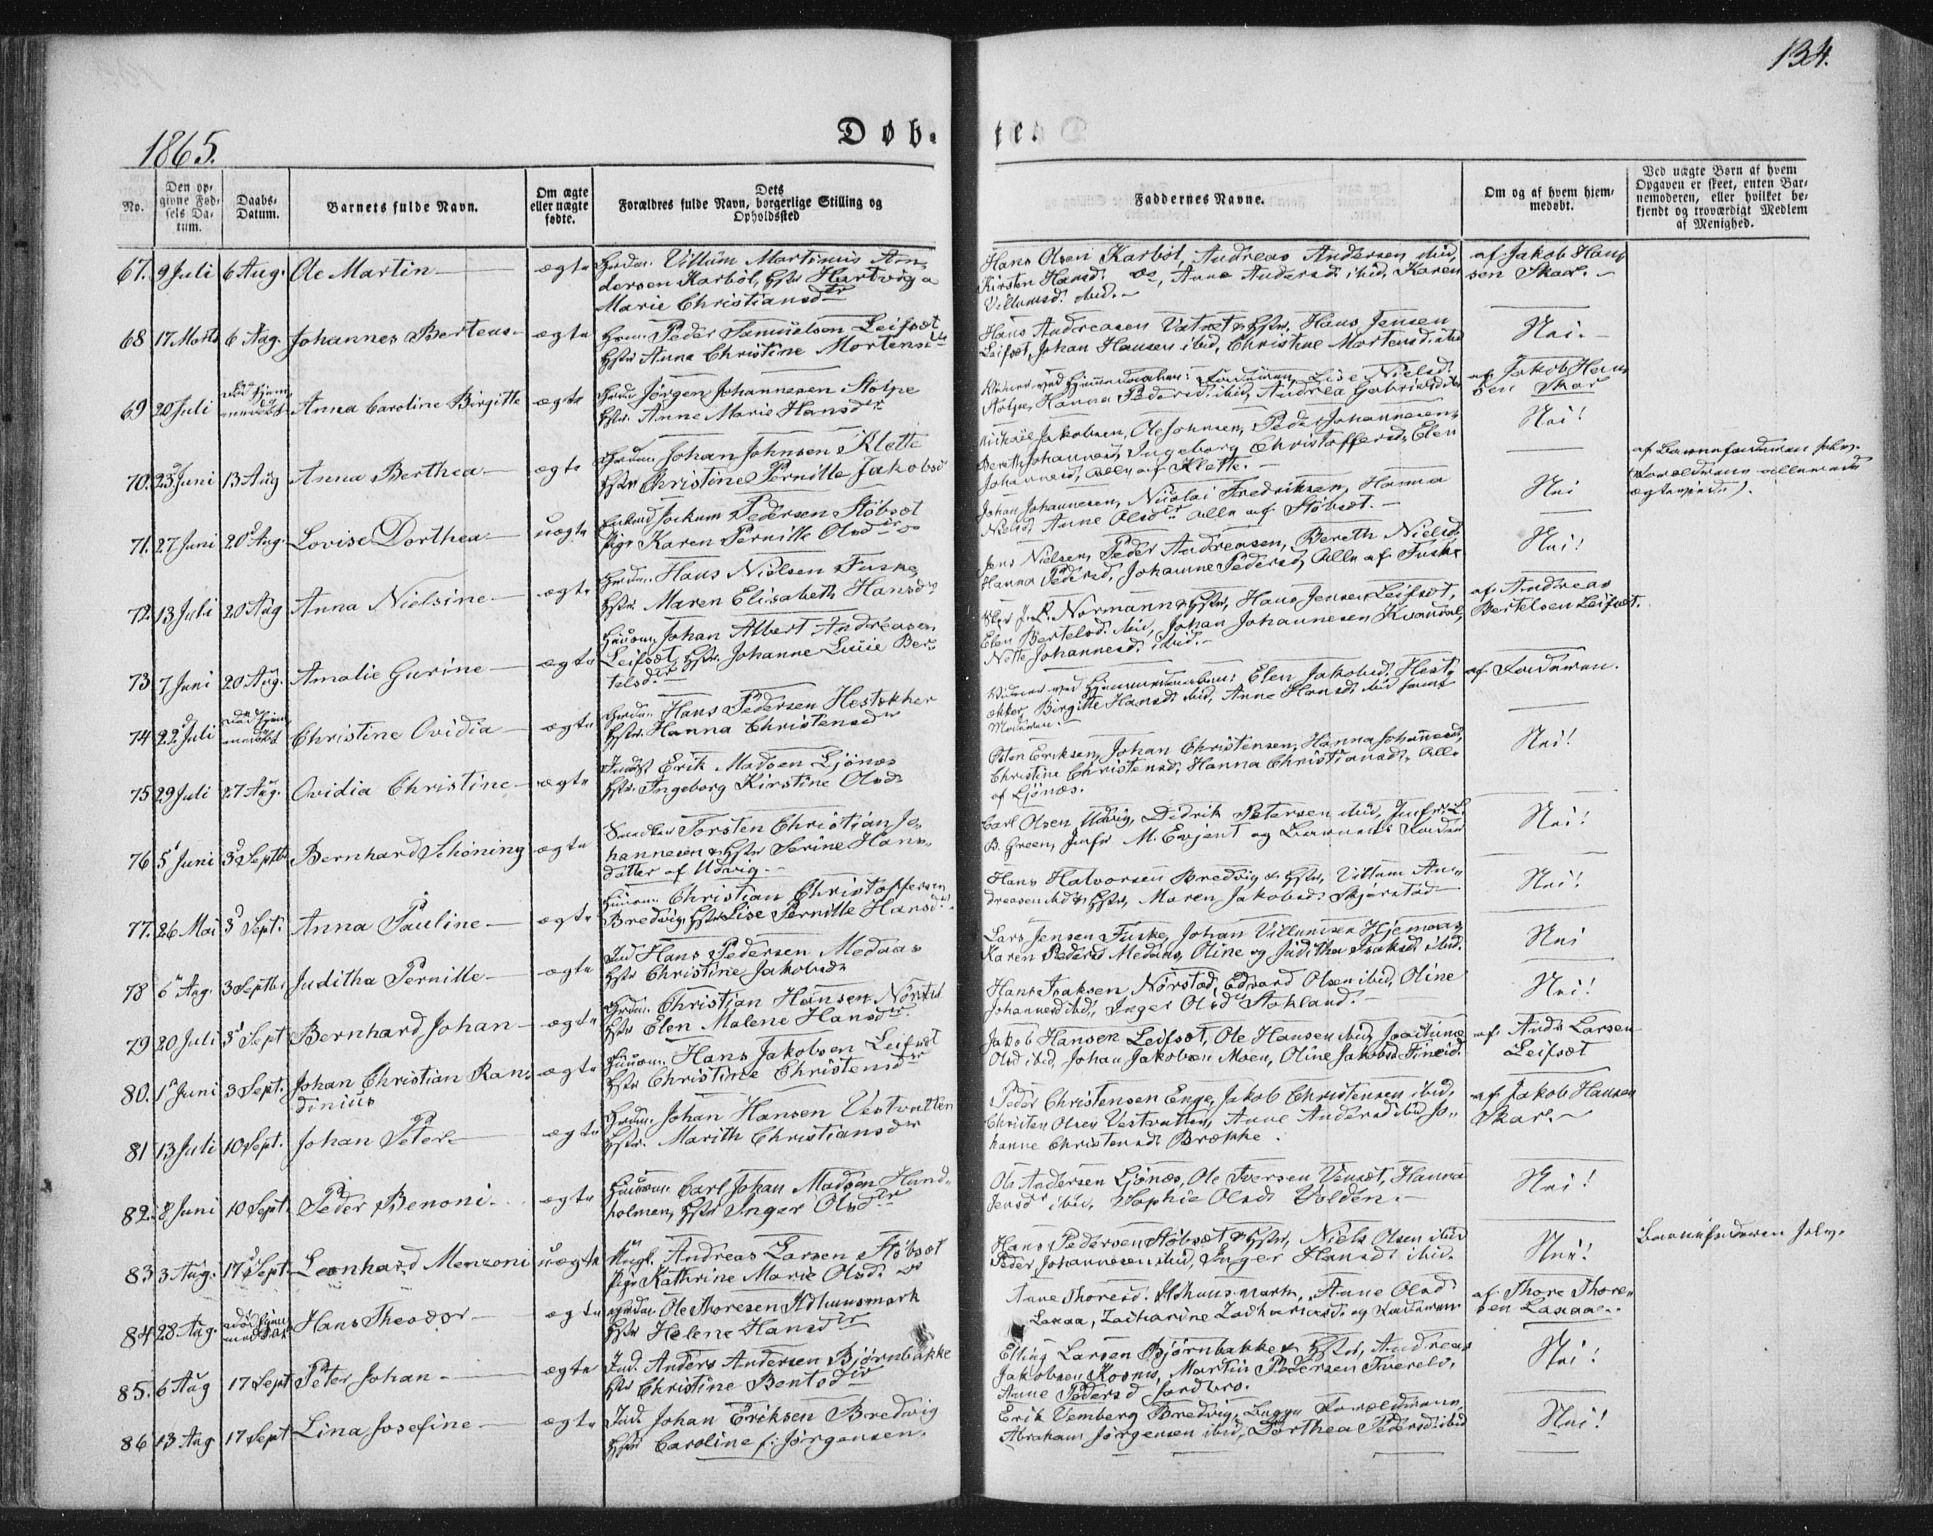 SAT, Ministerialprotokoller, klokkerbøker og fødselsregistre - Nordland, 852/L0738: Ministerialbok nr. 852A08, 1849-1865, s. 134